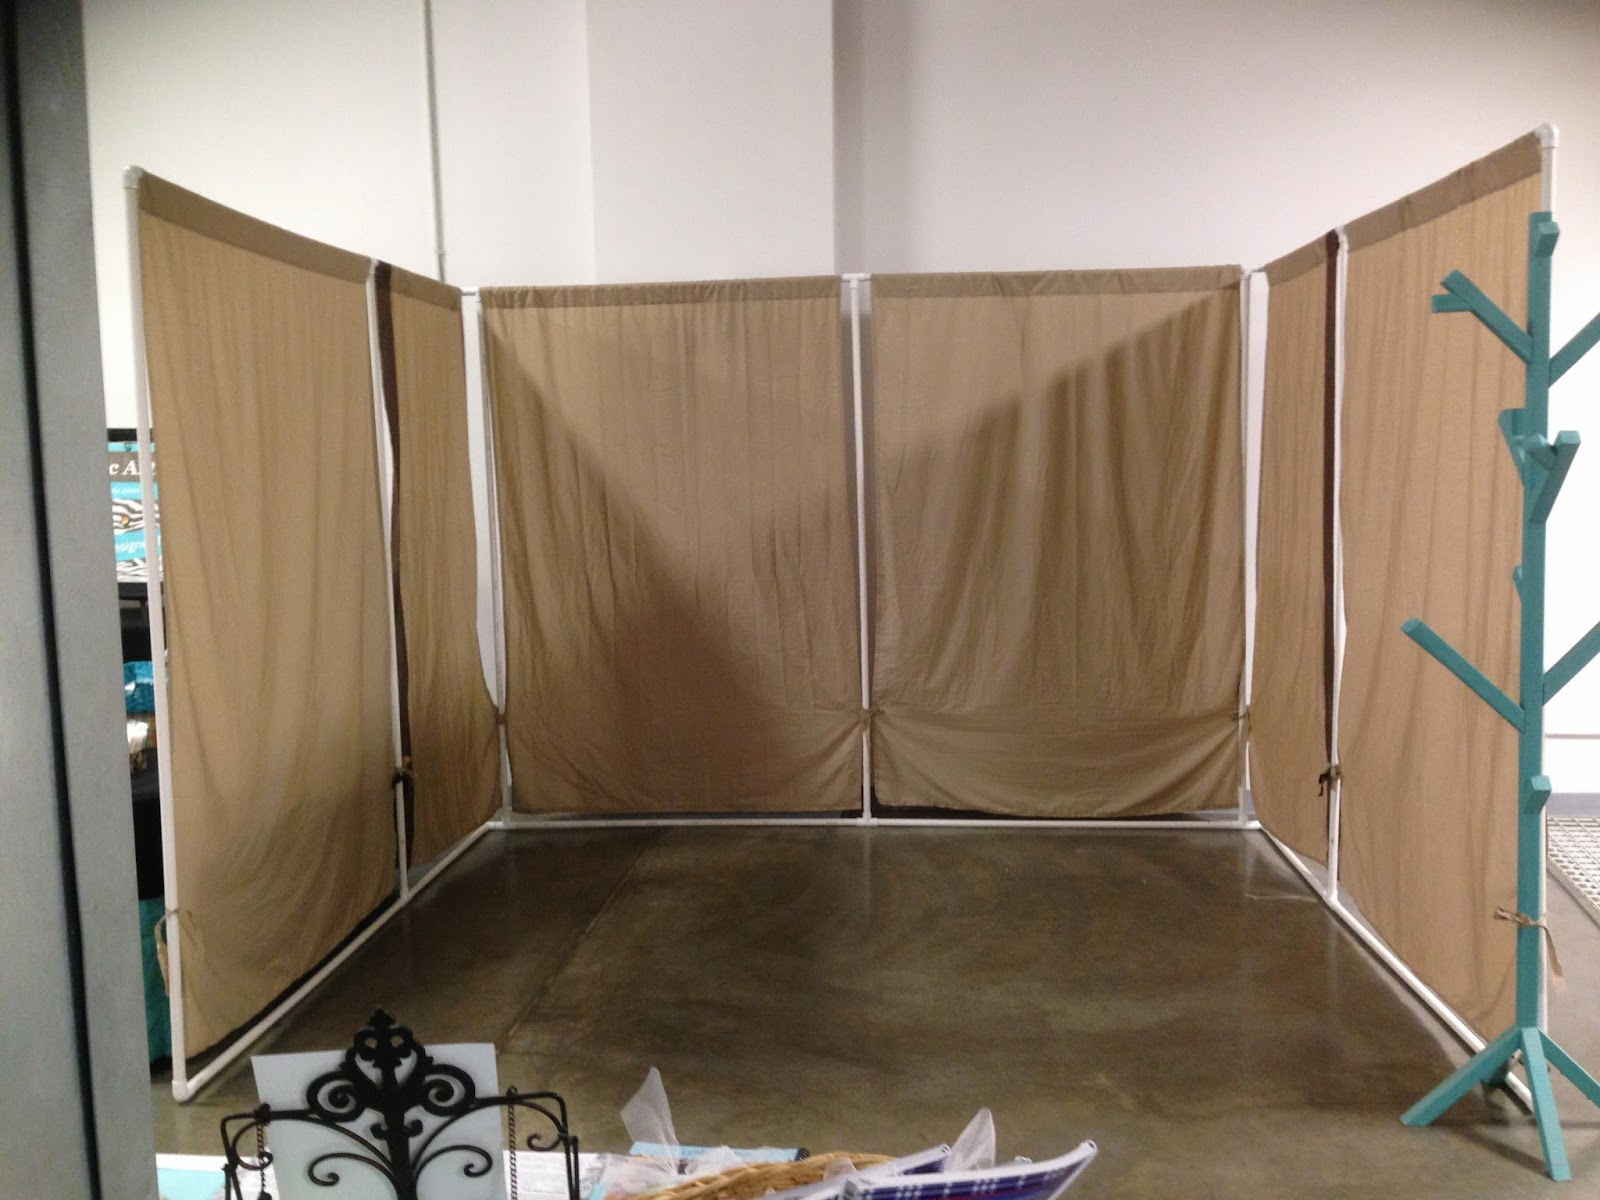 Craft Fair Booth Walls